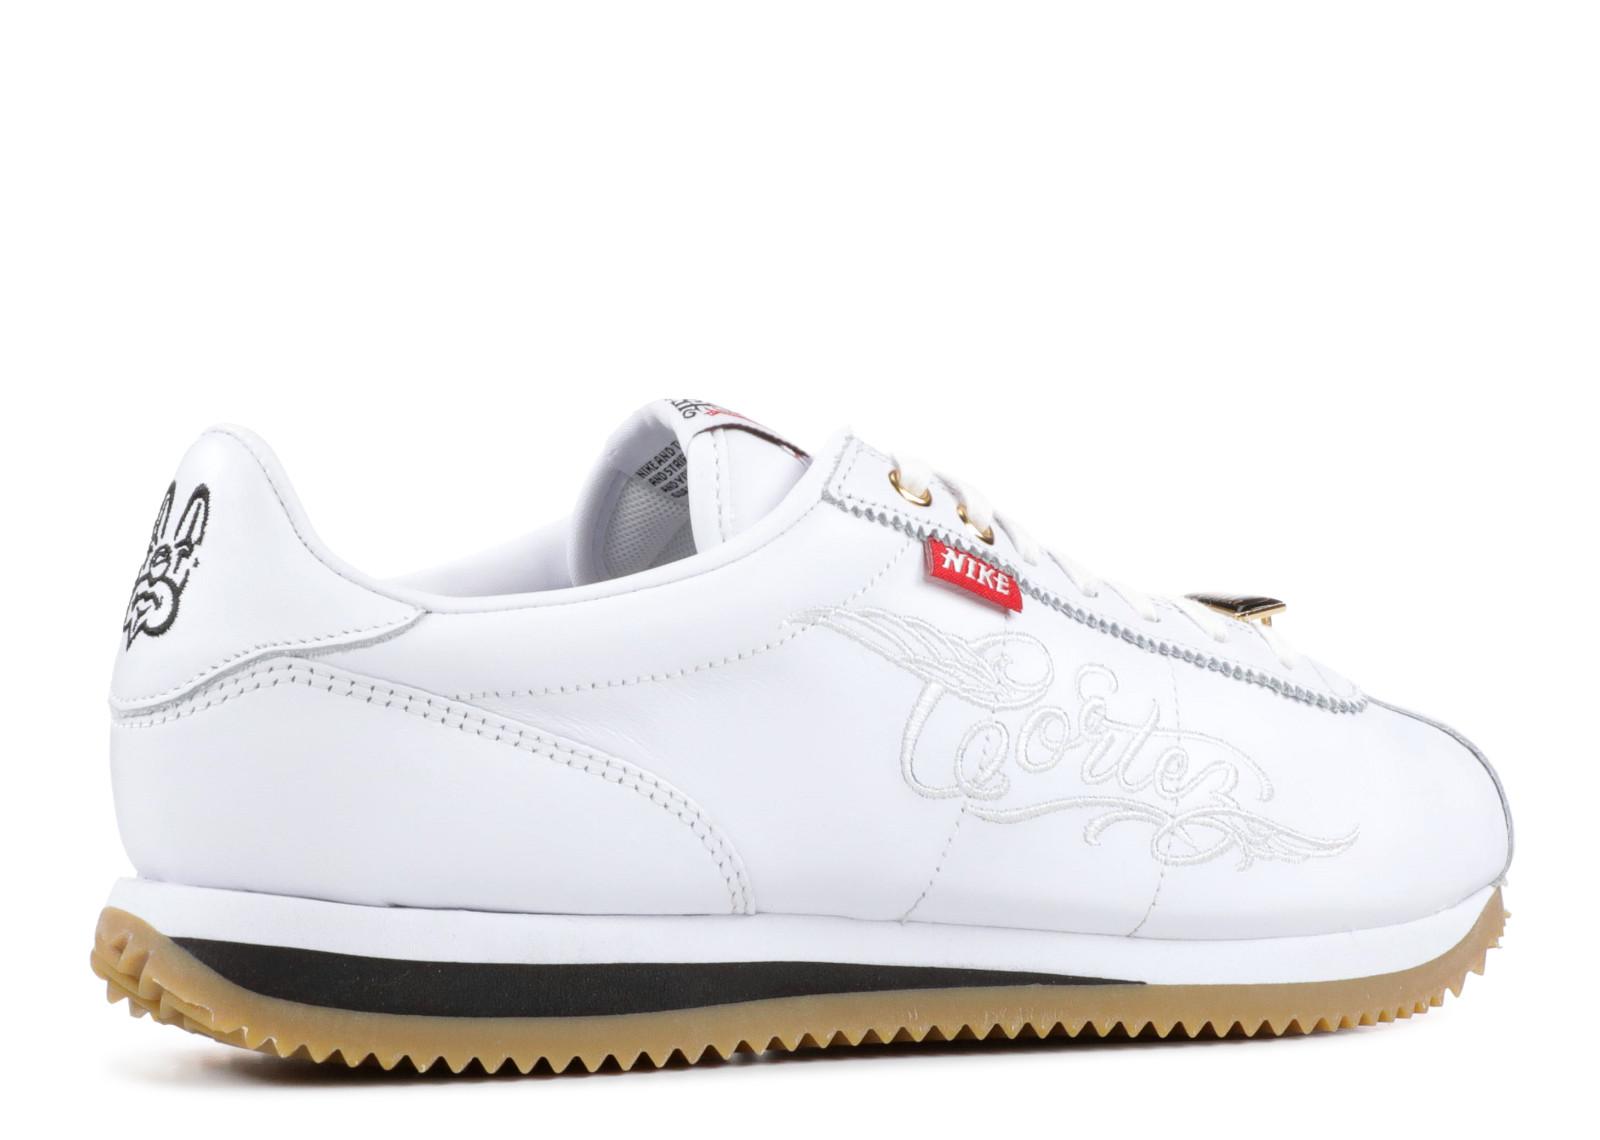 on sale bdf1b 06e75 Kick Avenue - Authentic Sneakers